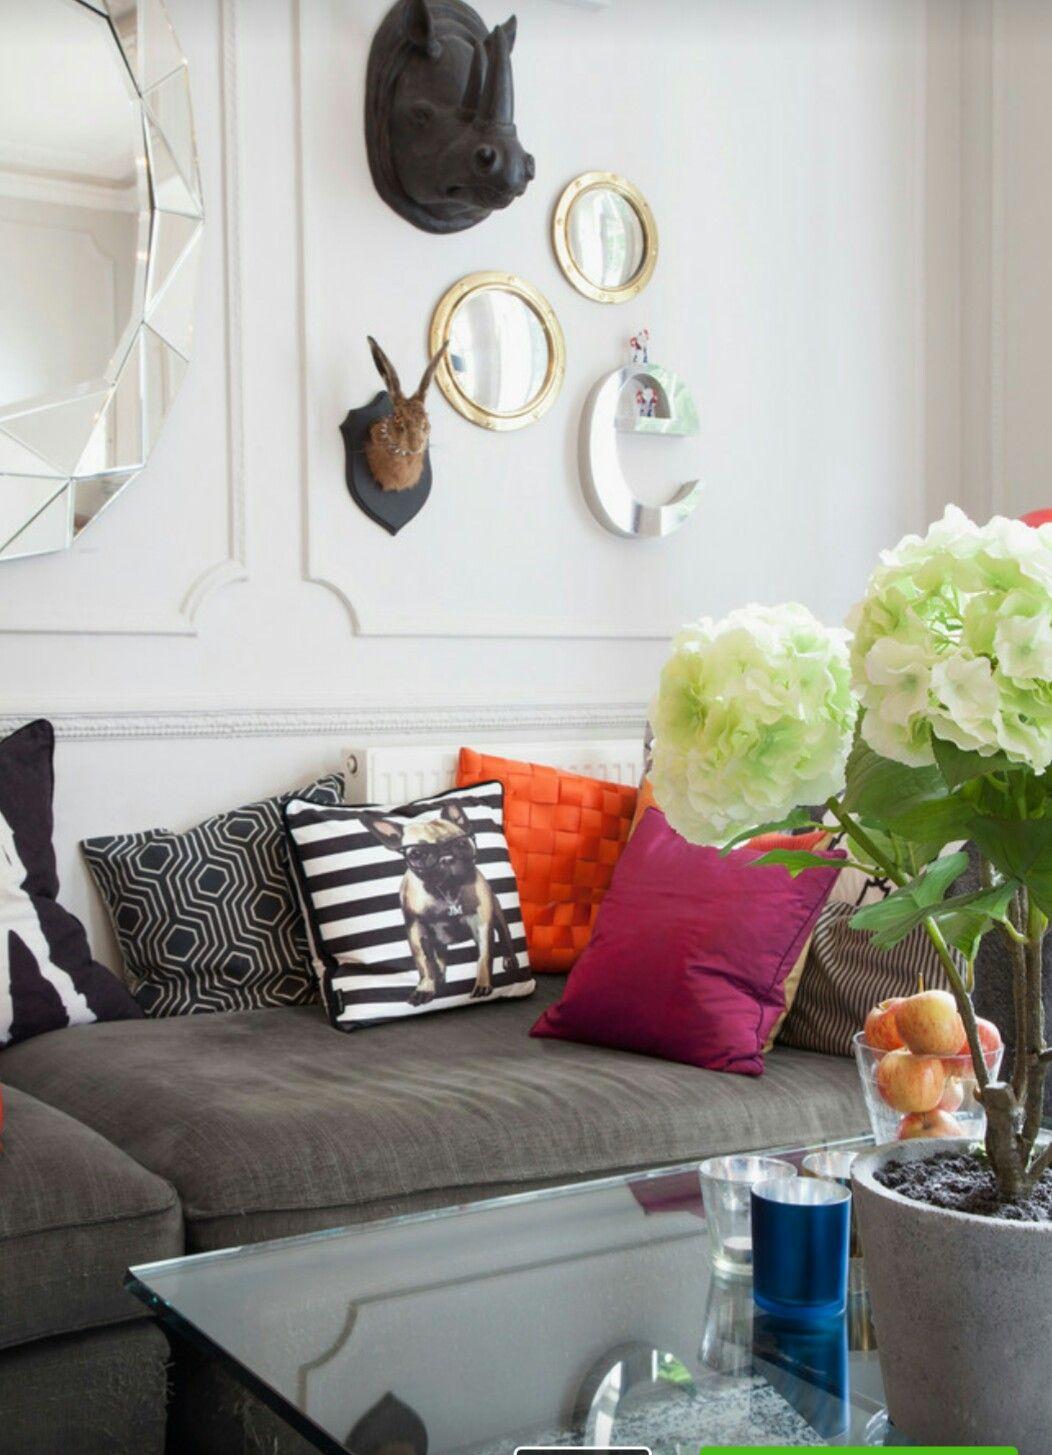 Eklektik Stil dekorasyon Eclectic Style living room ideas Photo - elaynebarre.com #livingroom #modernlivingroom #eclecticstyle #eklektikdekorasyon #salondekorasyonu #ıdeallivingroom